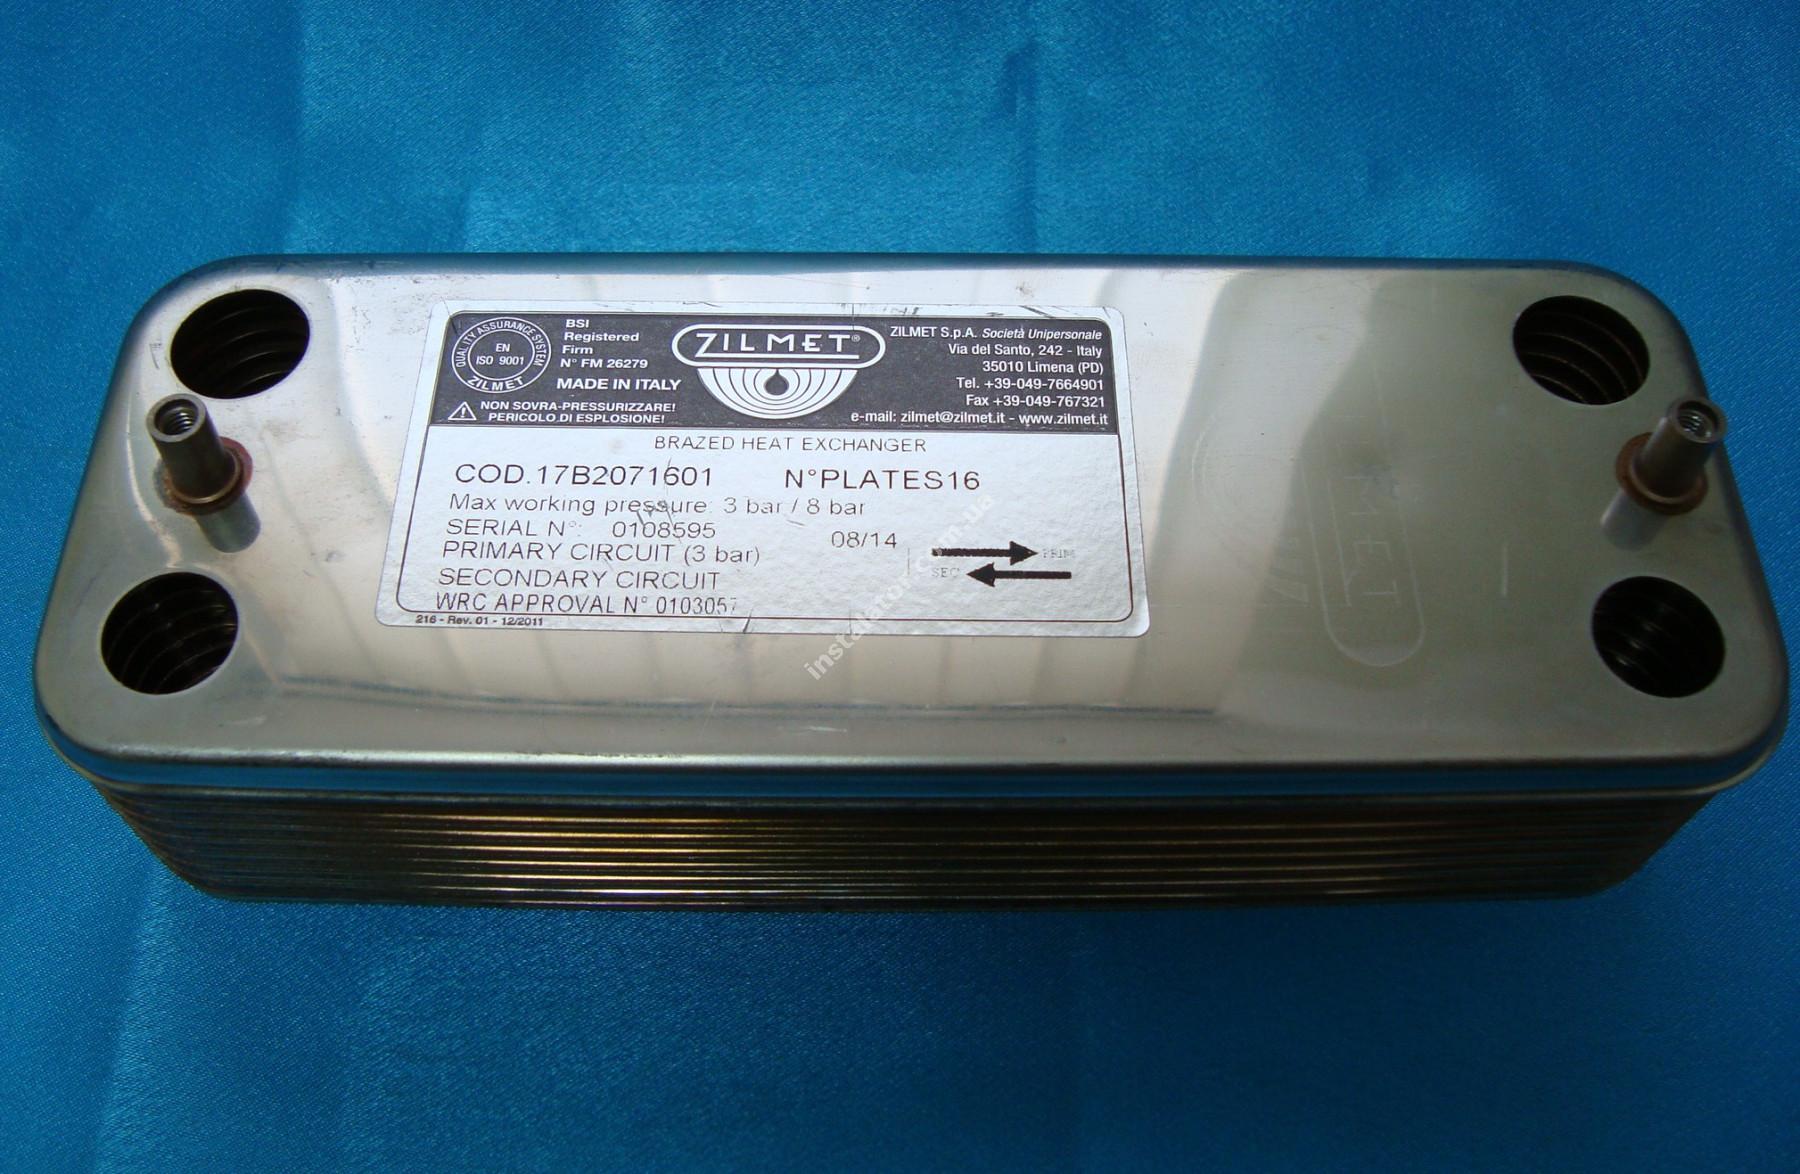 17B2071601 Теплообмінник вторинний Isofast F 28E, Isomax full-image-2